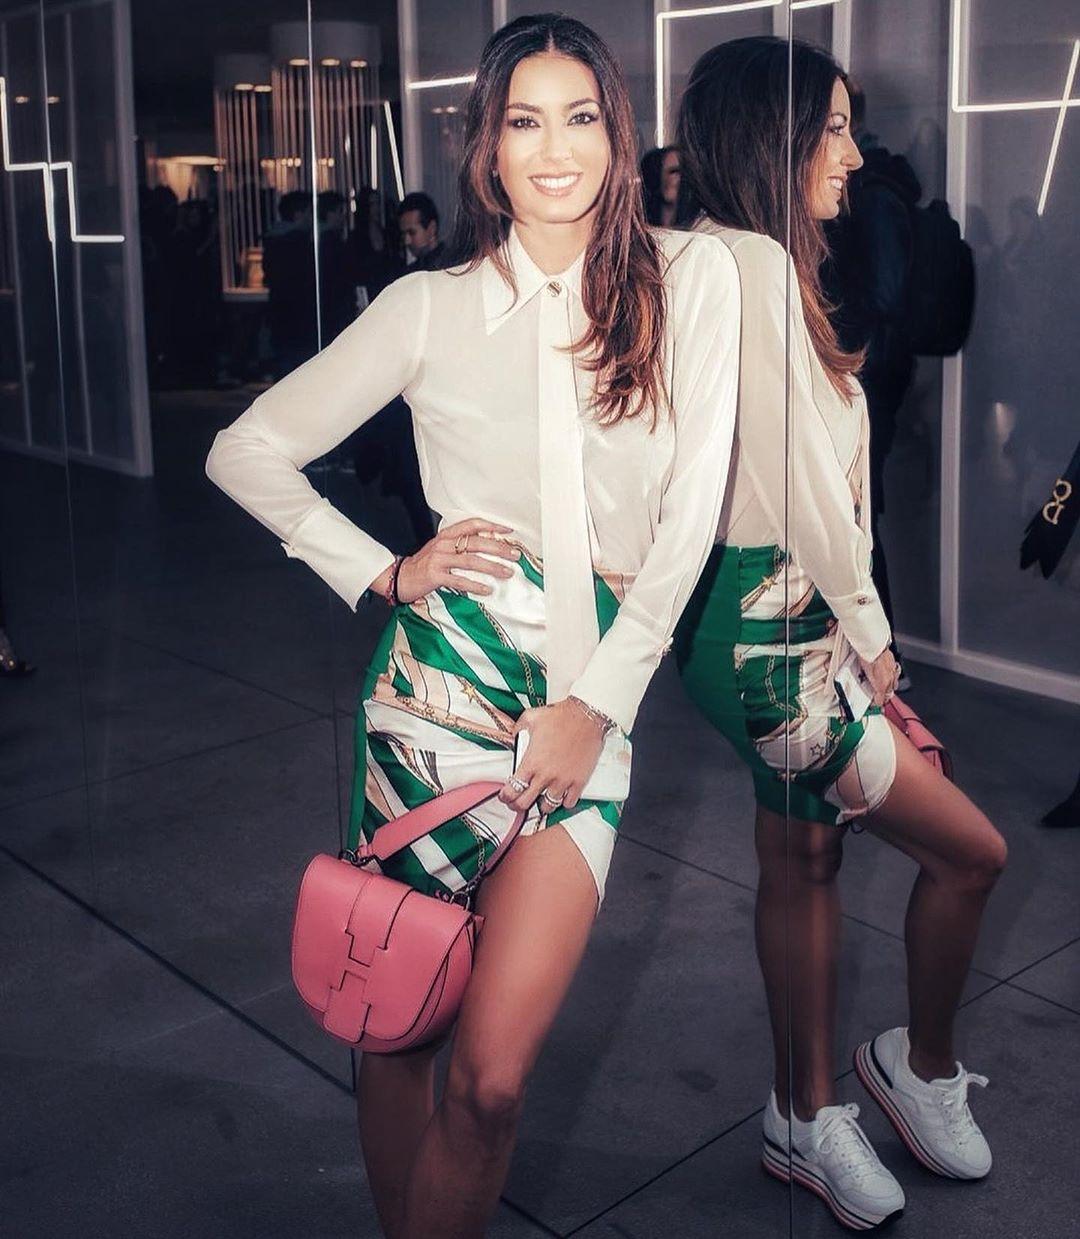 La bellissima Elisabetta Gregoraci, modella, attrice, conduttrice TV